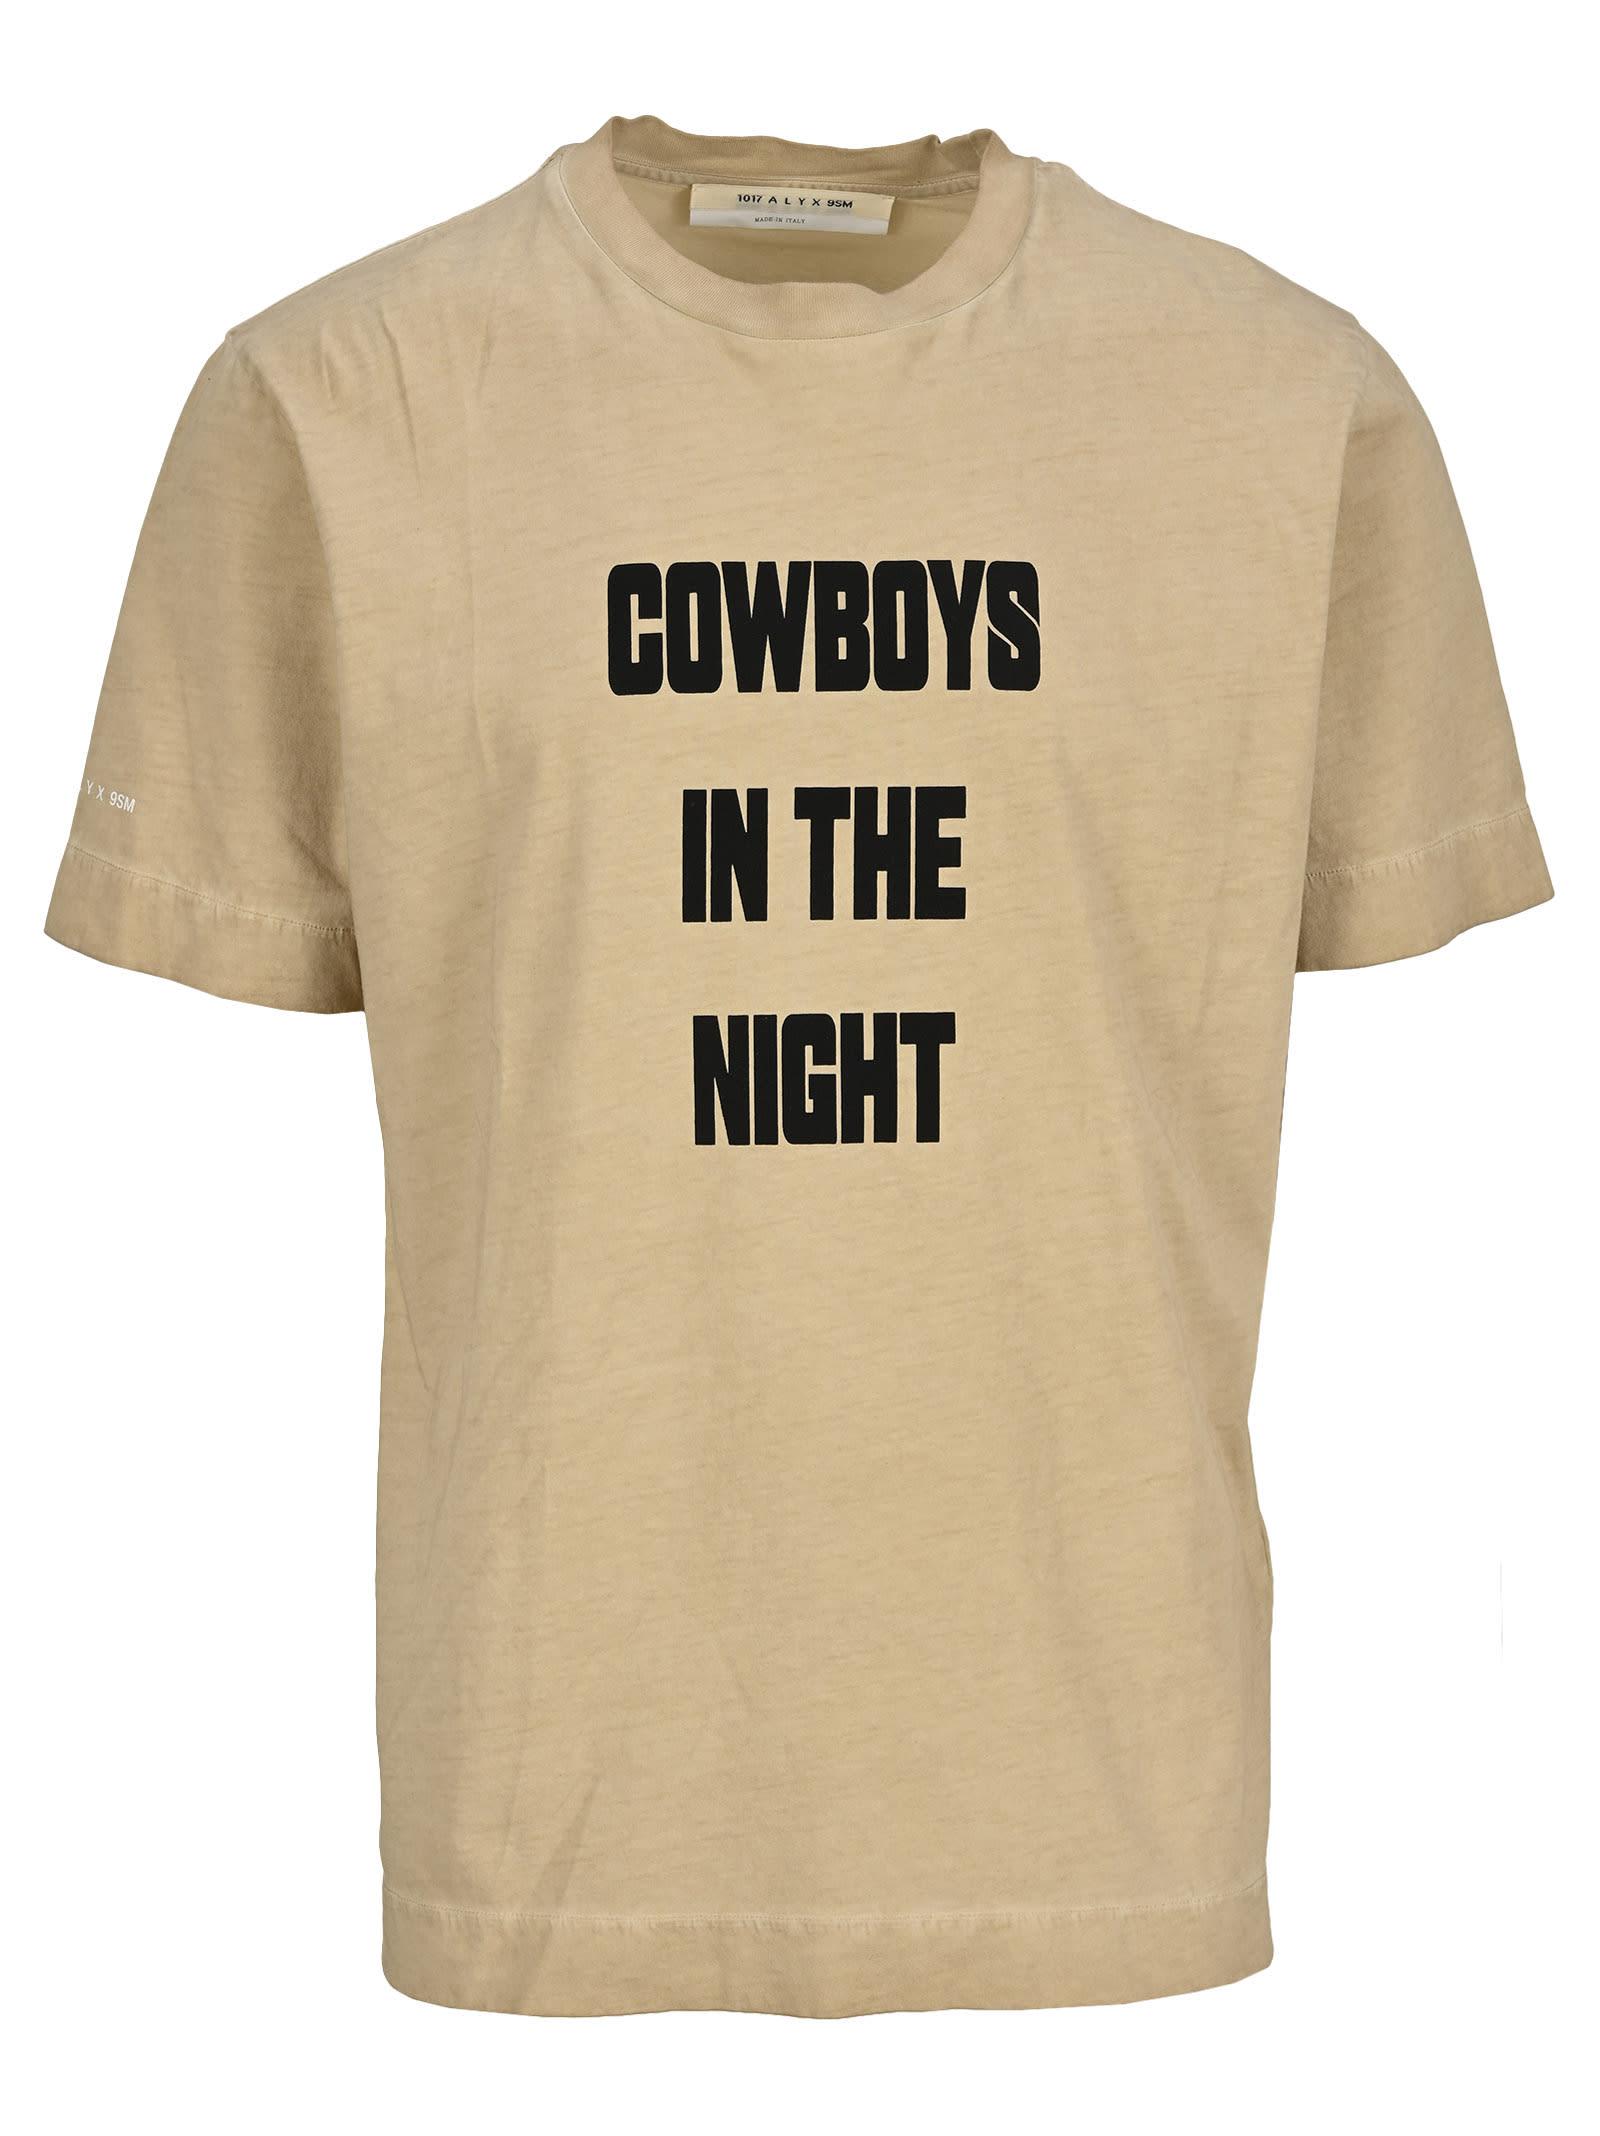 Alyx ALYX COWBOYS IN THE NIGHT T-SHIRT